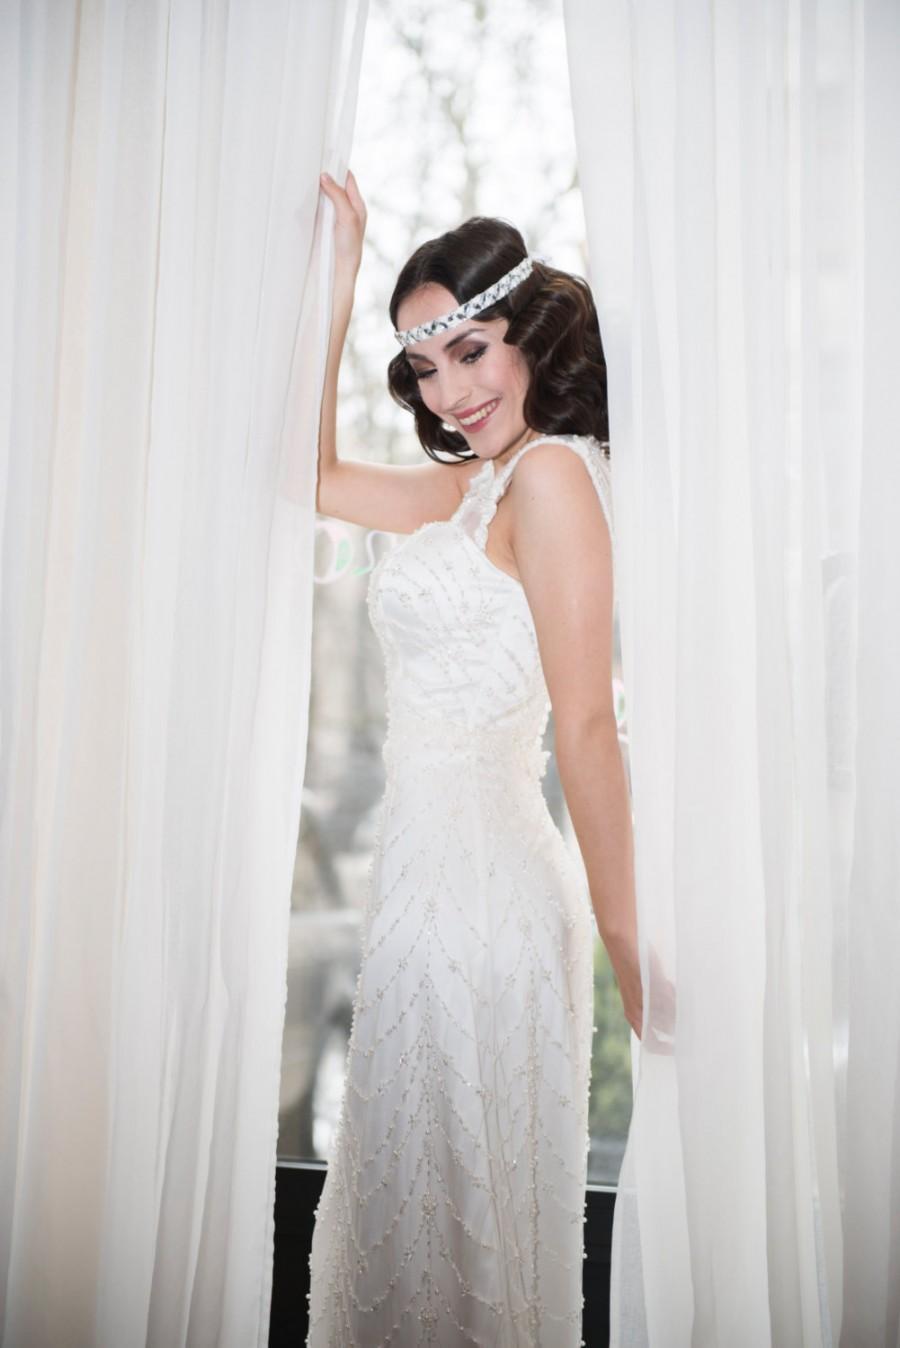 Wedding - Ivory Lace Wedding Dress L6, Satin and Lace Wedding Dress with Pearls, Romantic wedding gown, Classic bridal dress, Custom order